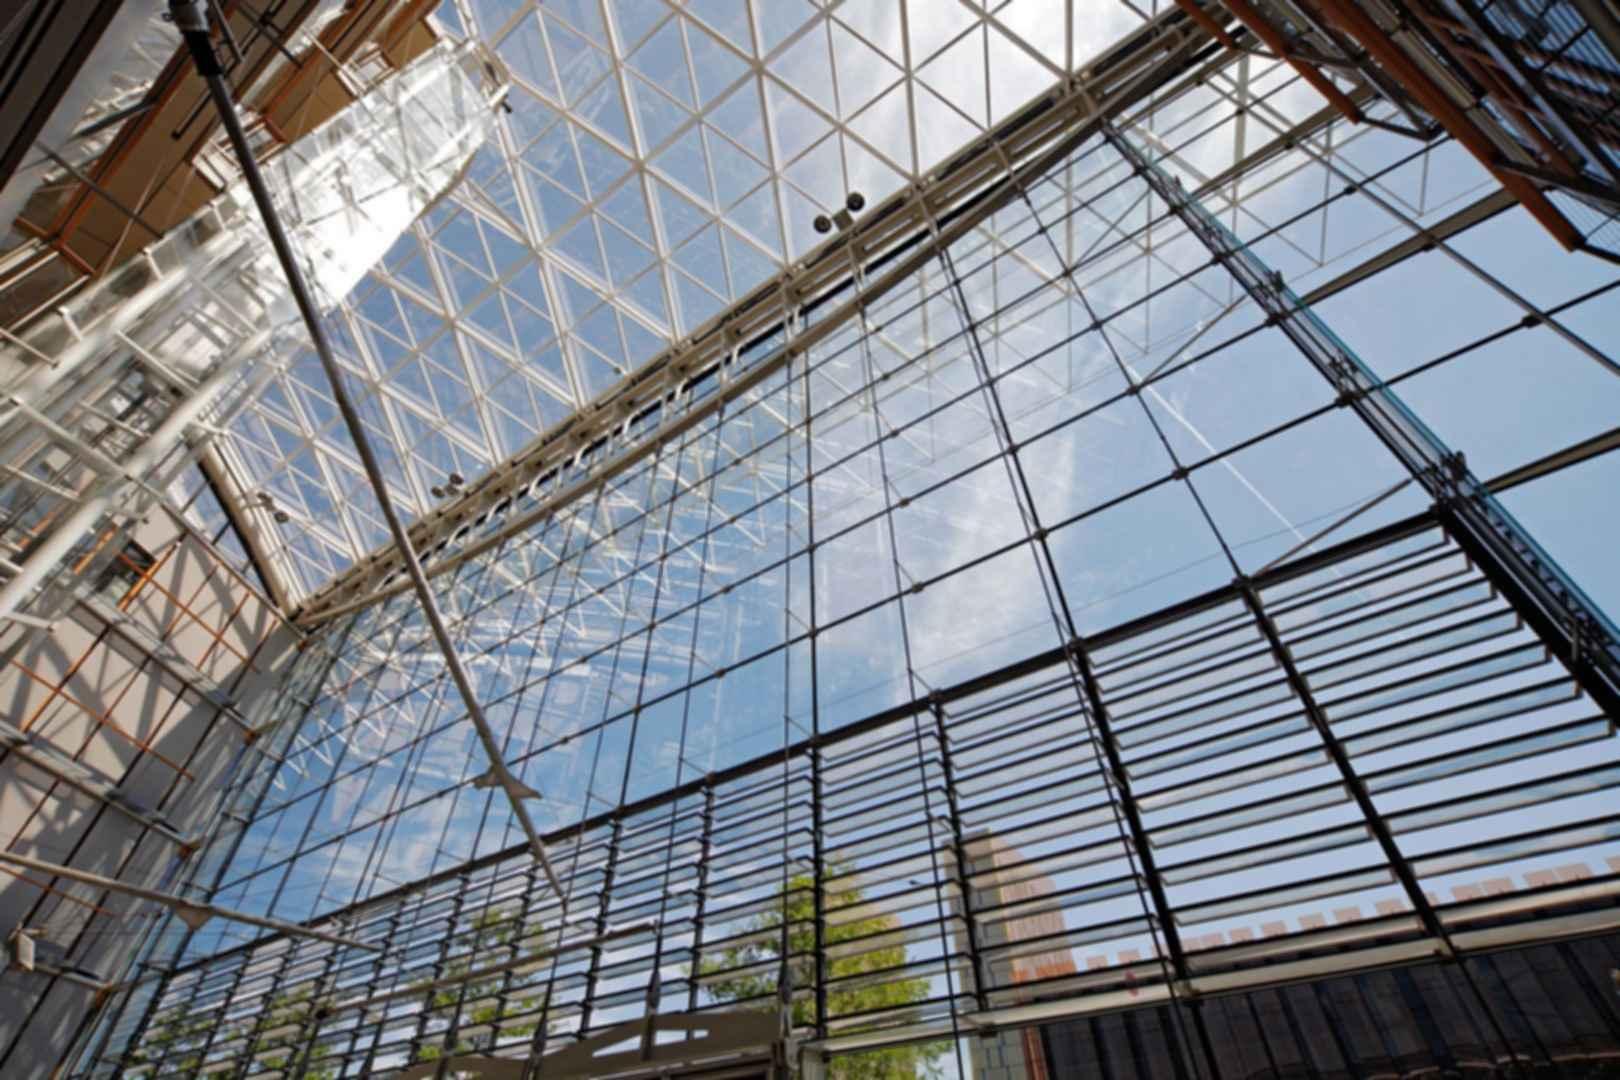 European Investment Bank - Interior/Roof/Windows